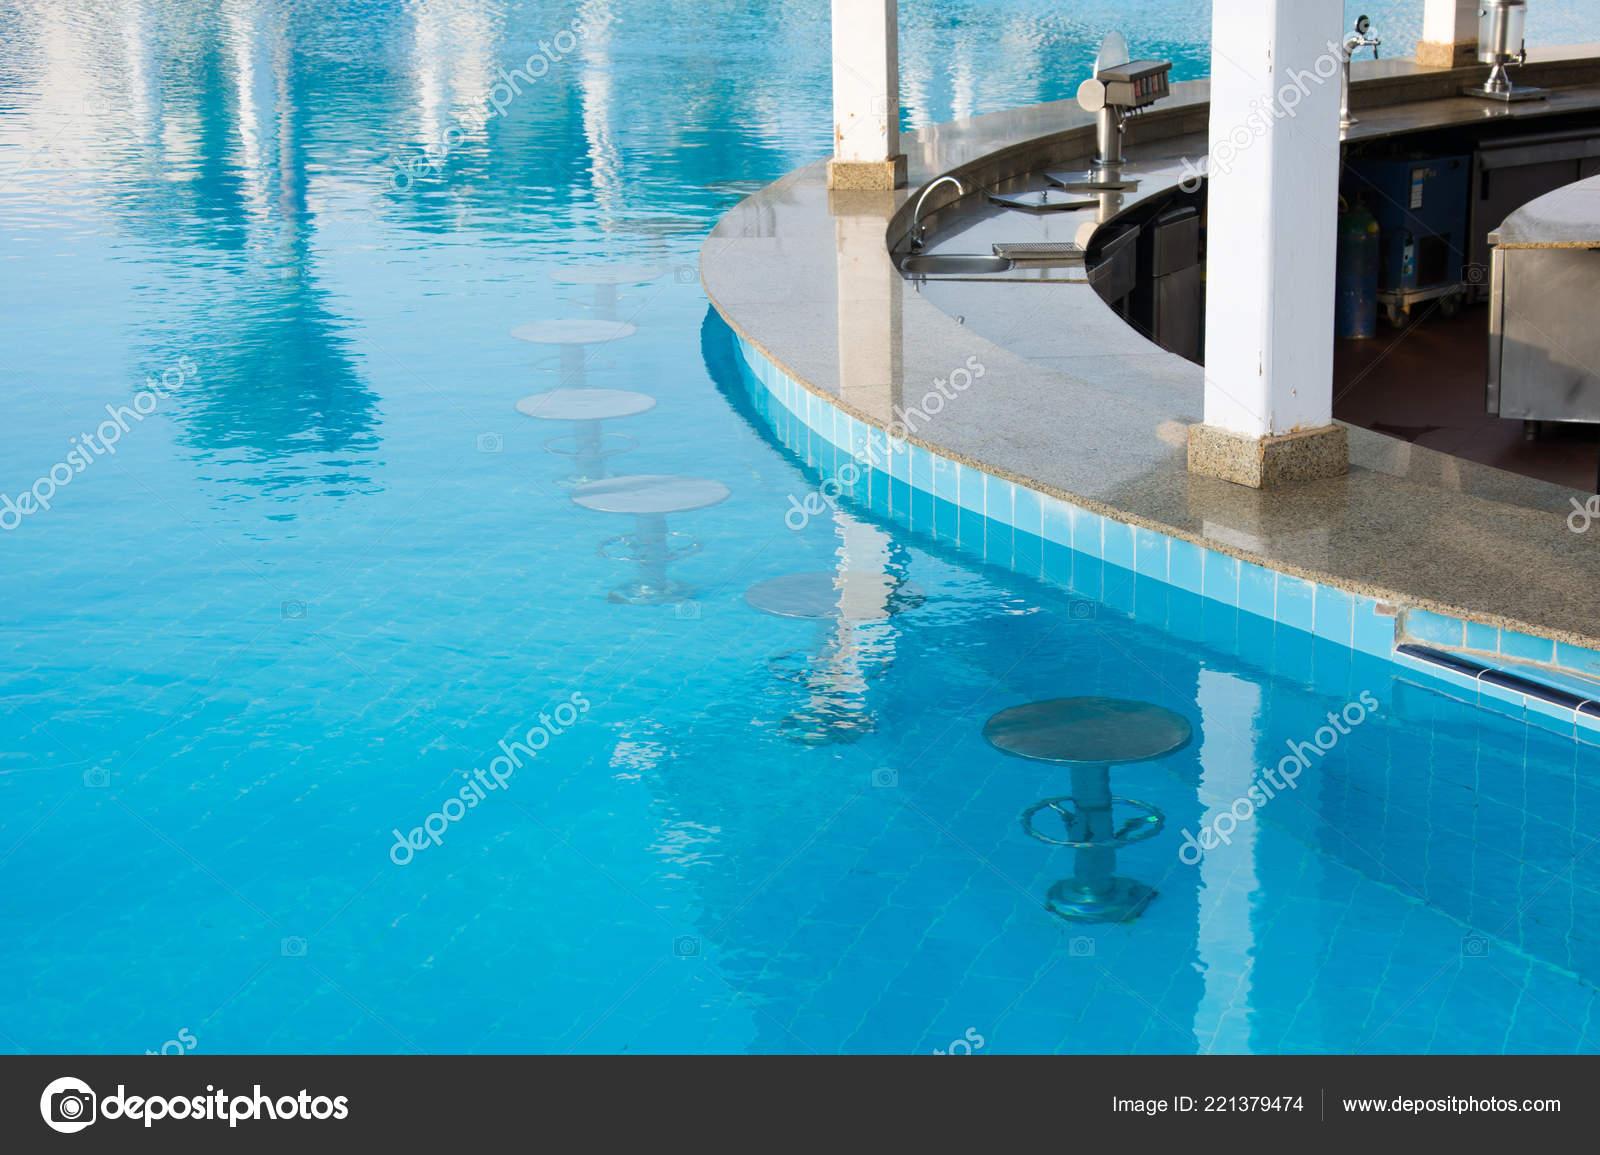 Underwater swimming pool bar stools | Swimming Pool Bar Area ...